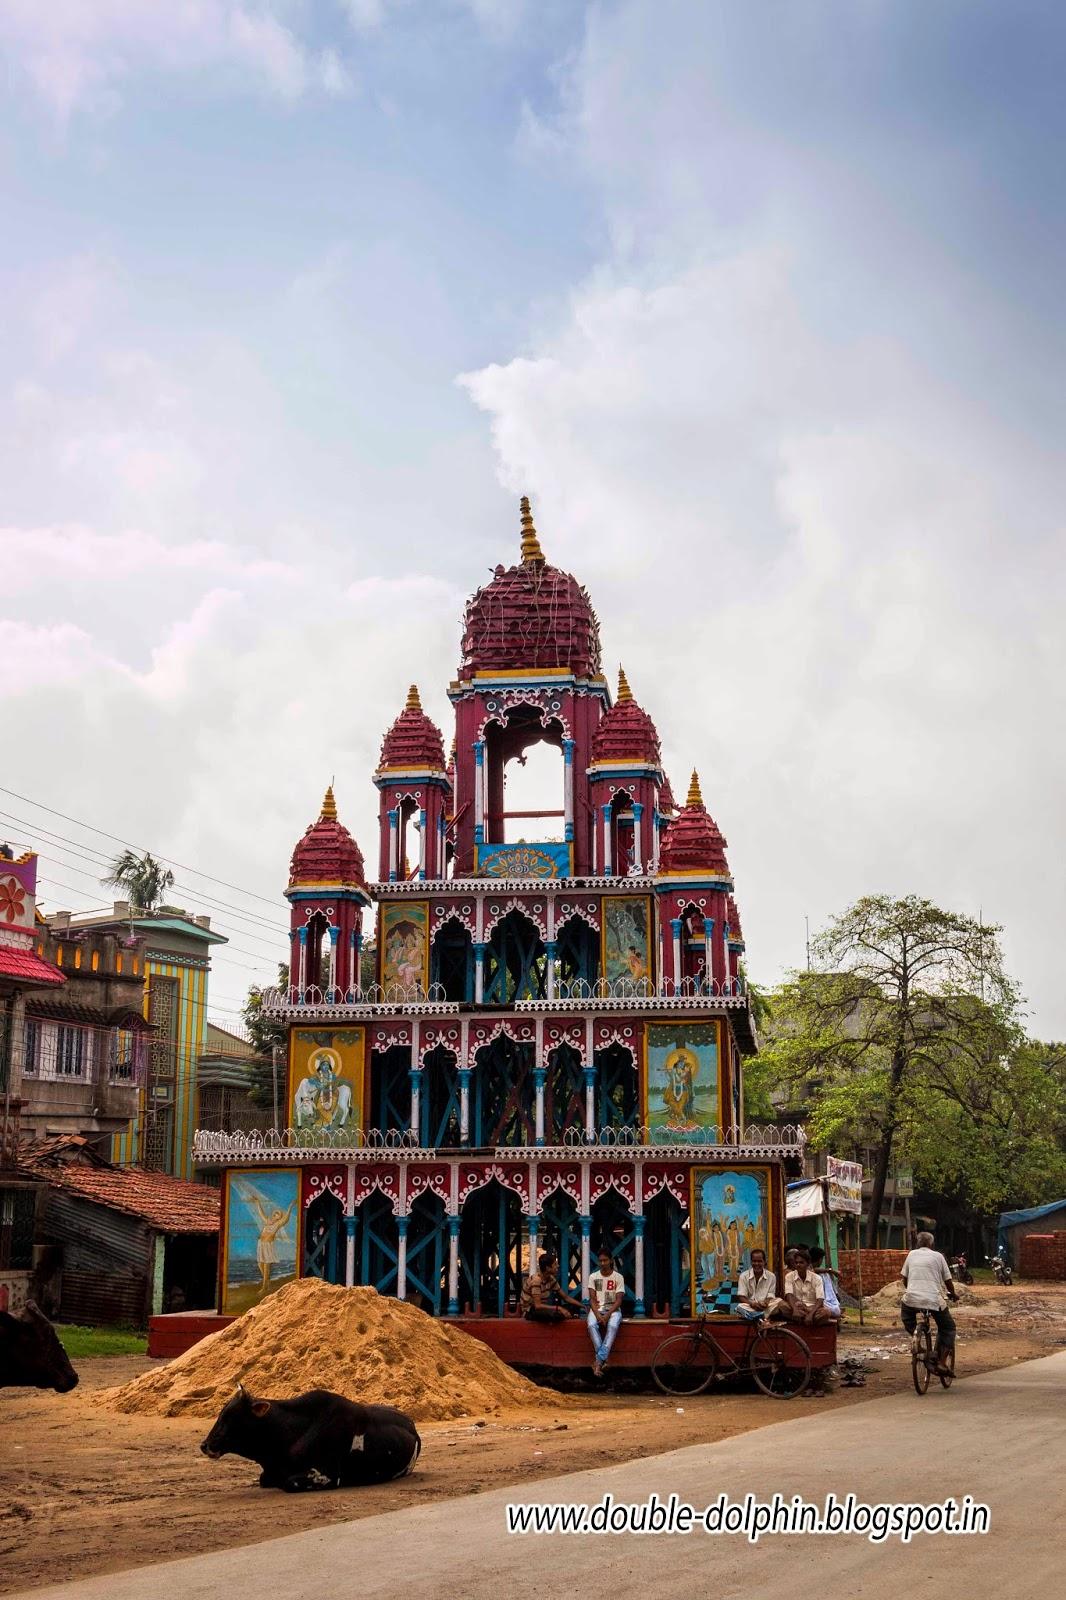 The Concrete Paparazzi: The Jagannath Temple of Mahesh